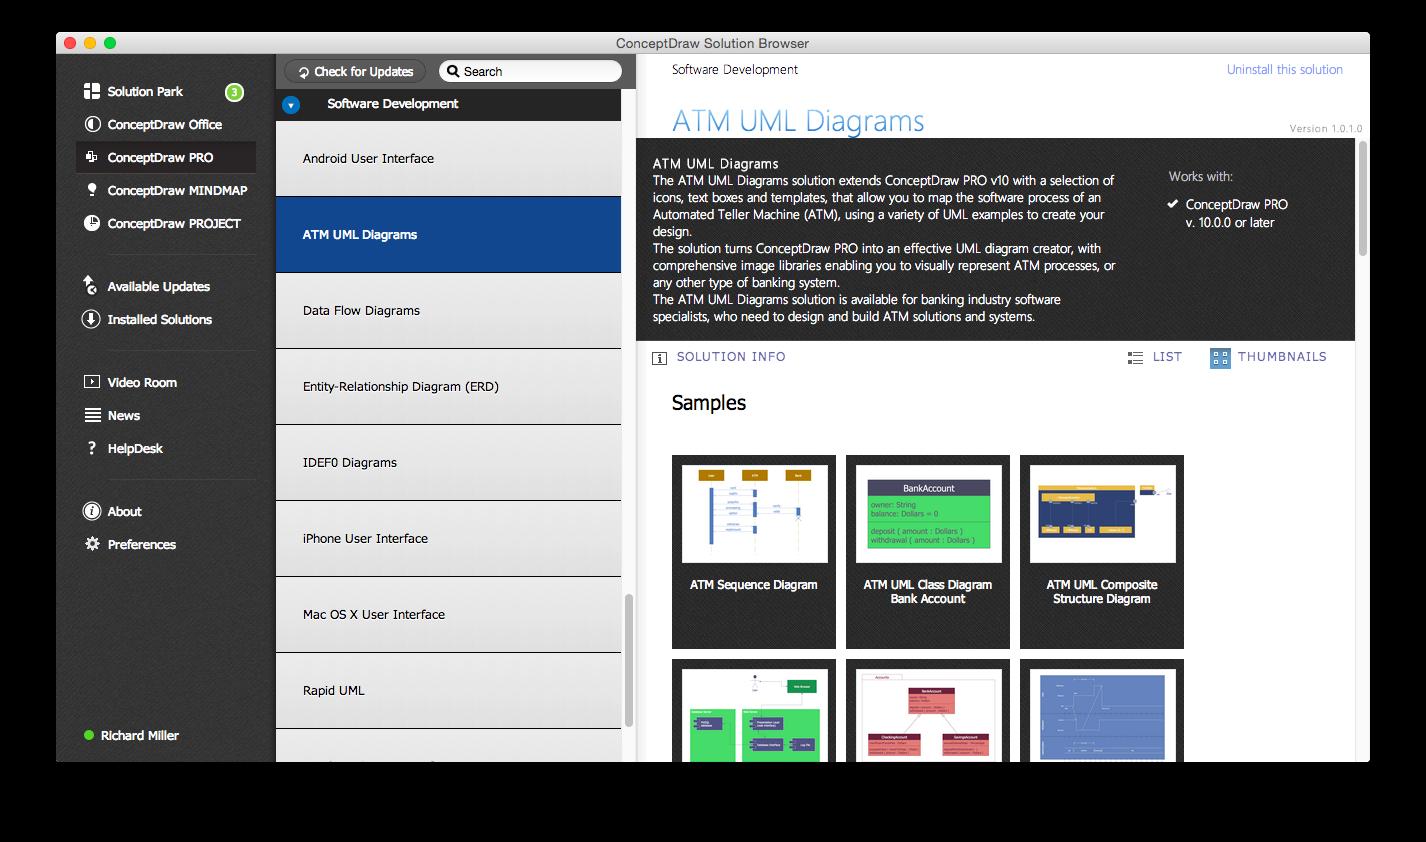 ATM UML Diagrams Solution — Start using